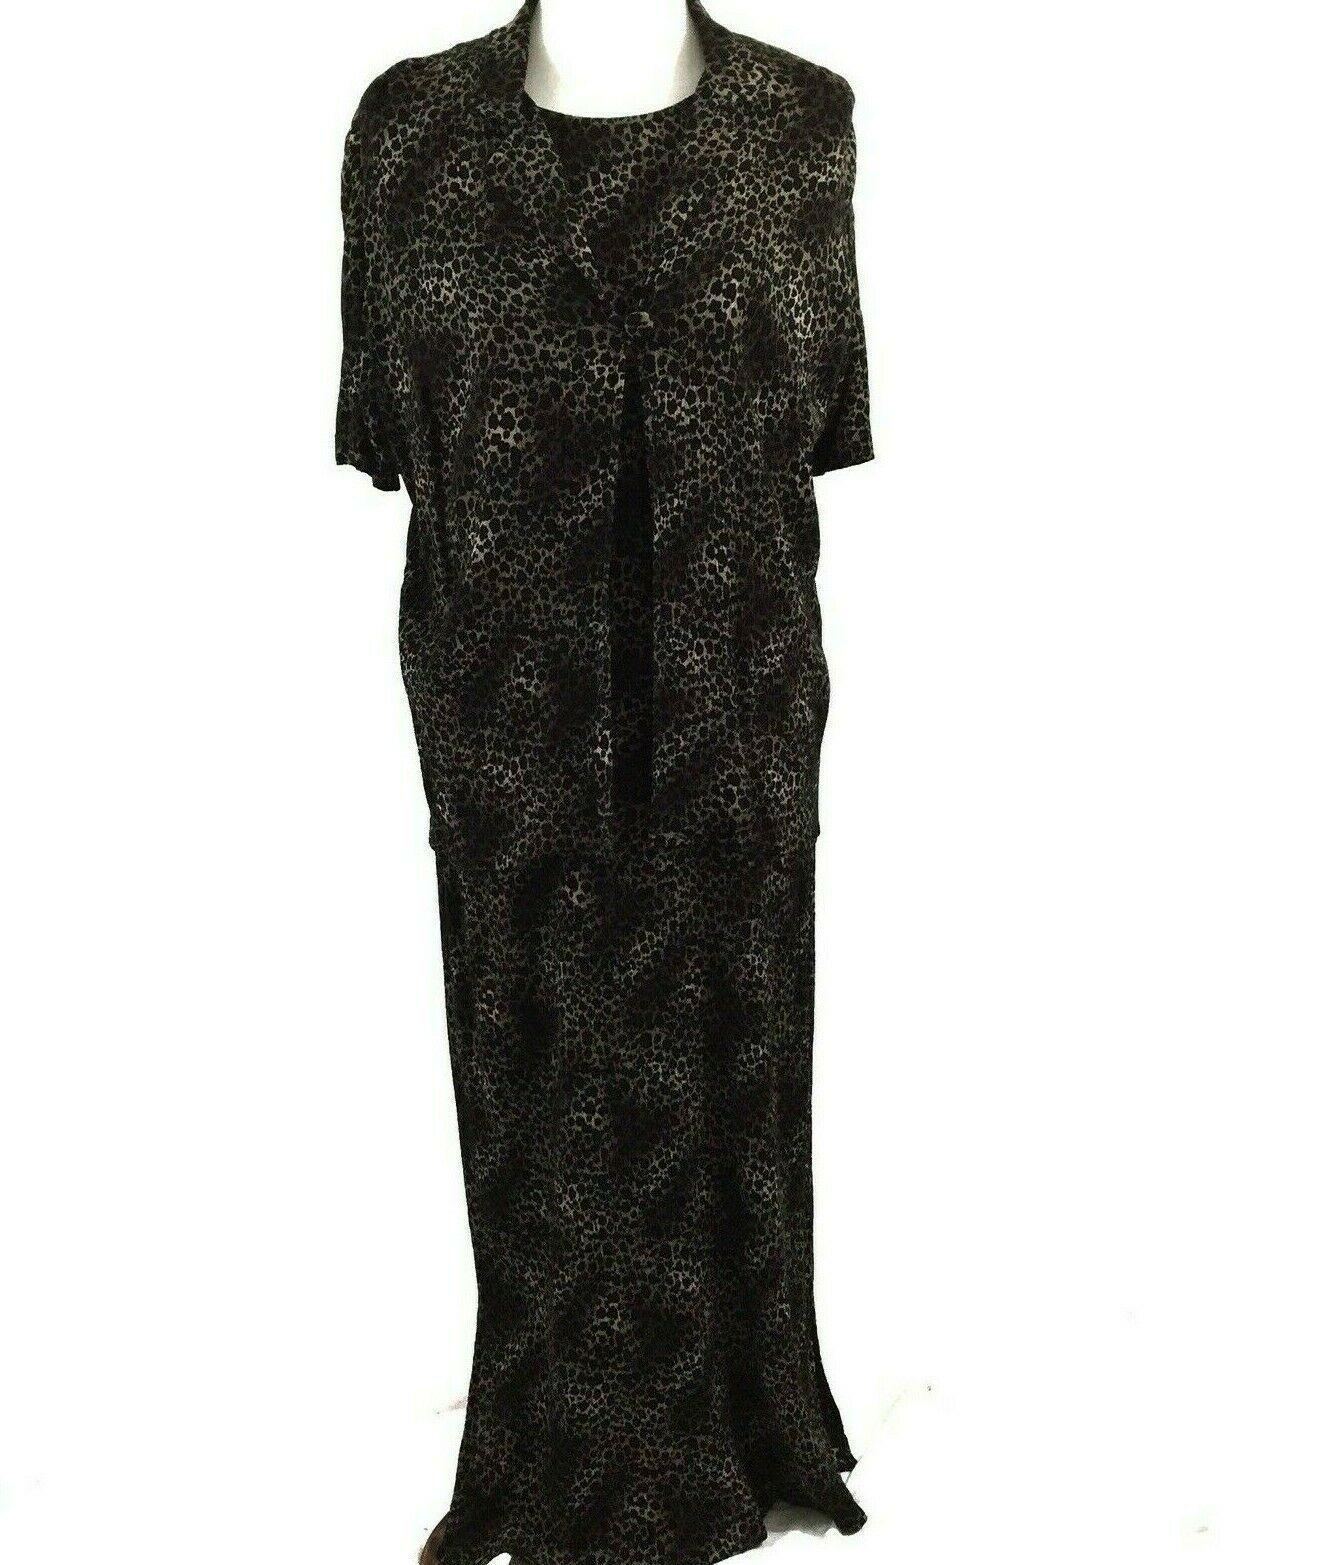 KSL Karin Stevens Sleeveless Maxi Dress and Jacket Size 14W Brown Animal Print